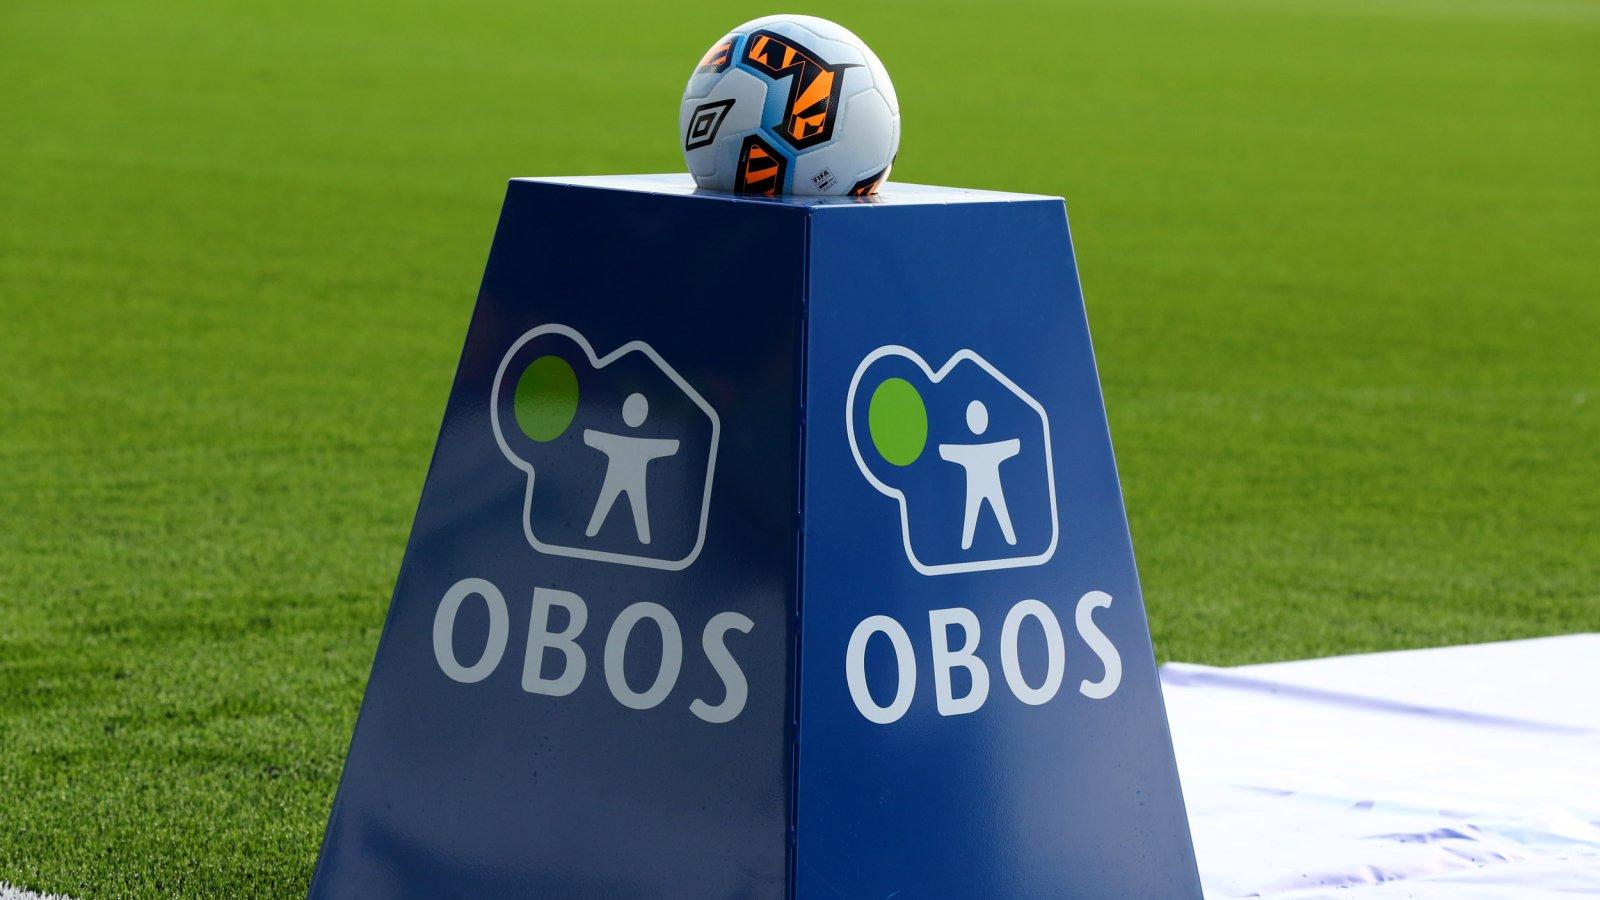 Kampballen i den 3. serierunden i OBOS-ligaen, mellom Ull/Kisa og Strømmen på Jessheim stadion.